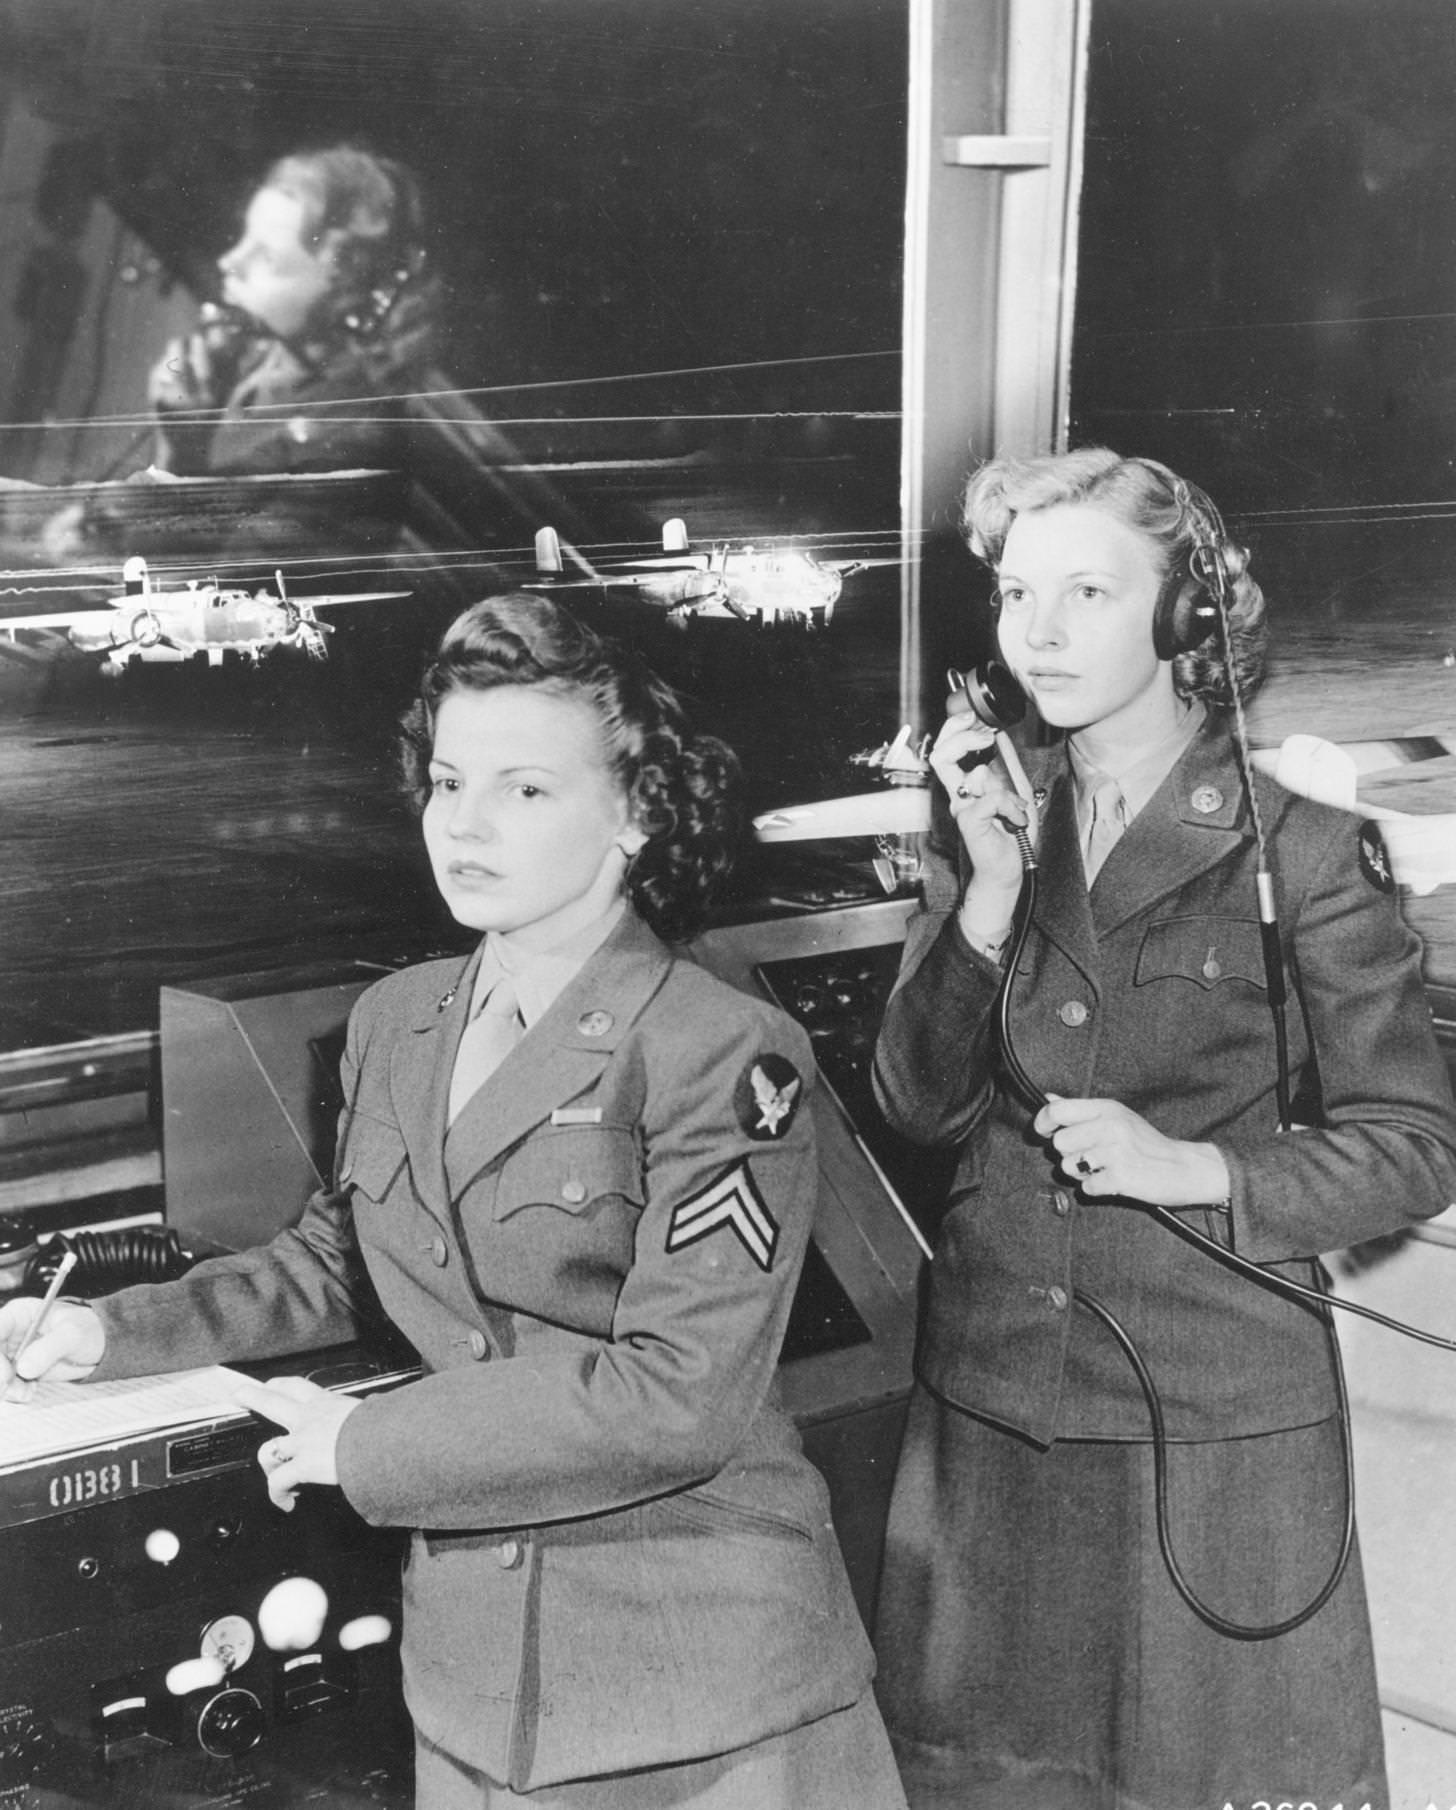 Women S Army Corps Randolph Field Texas 1944 2145 2667 Wwii Women Women S Army Corps Military Women